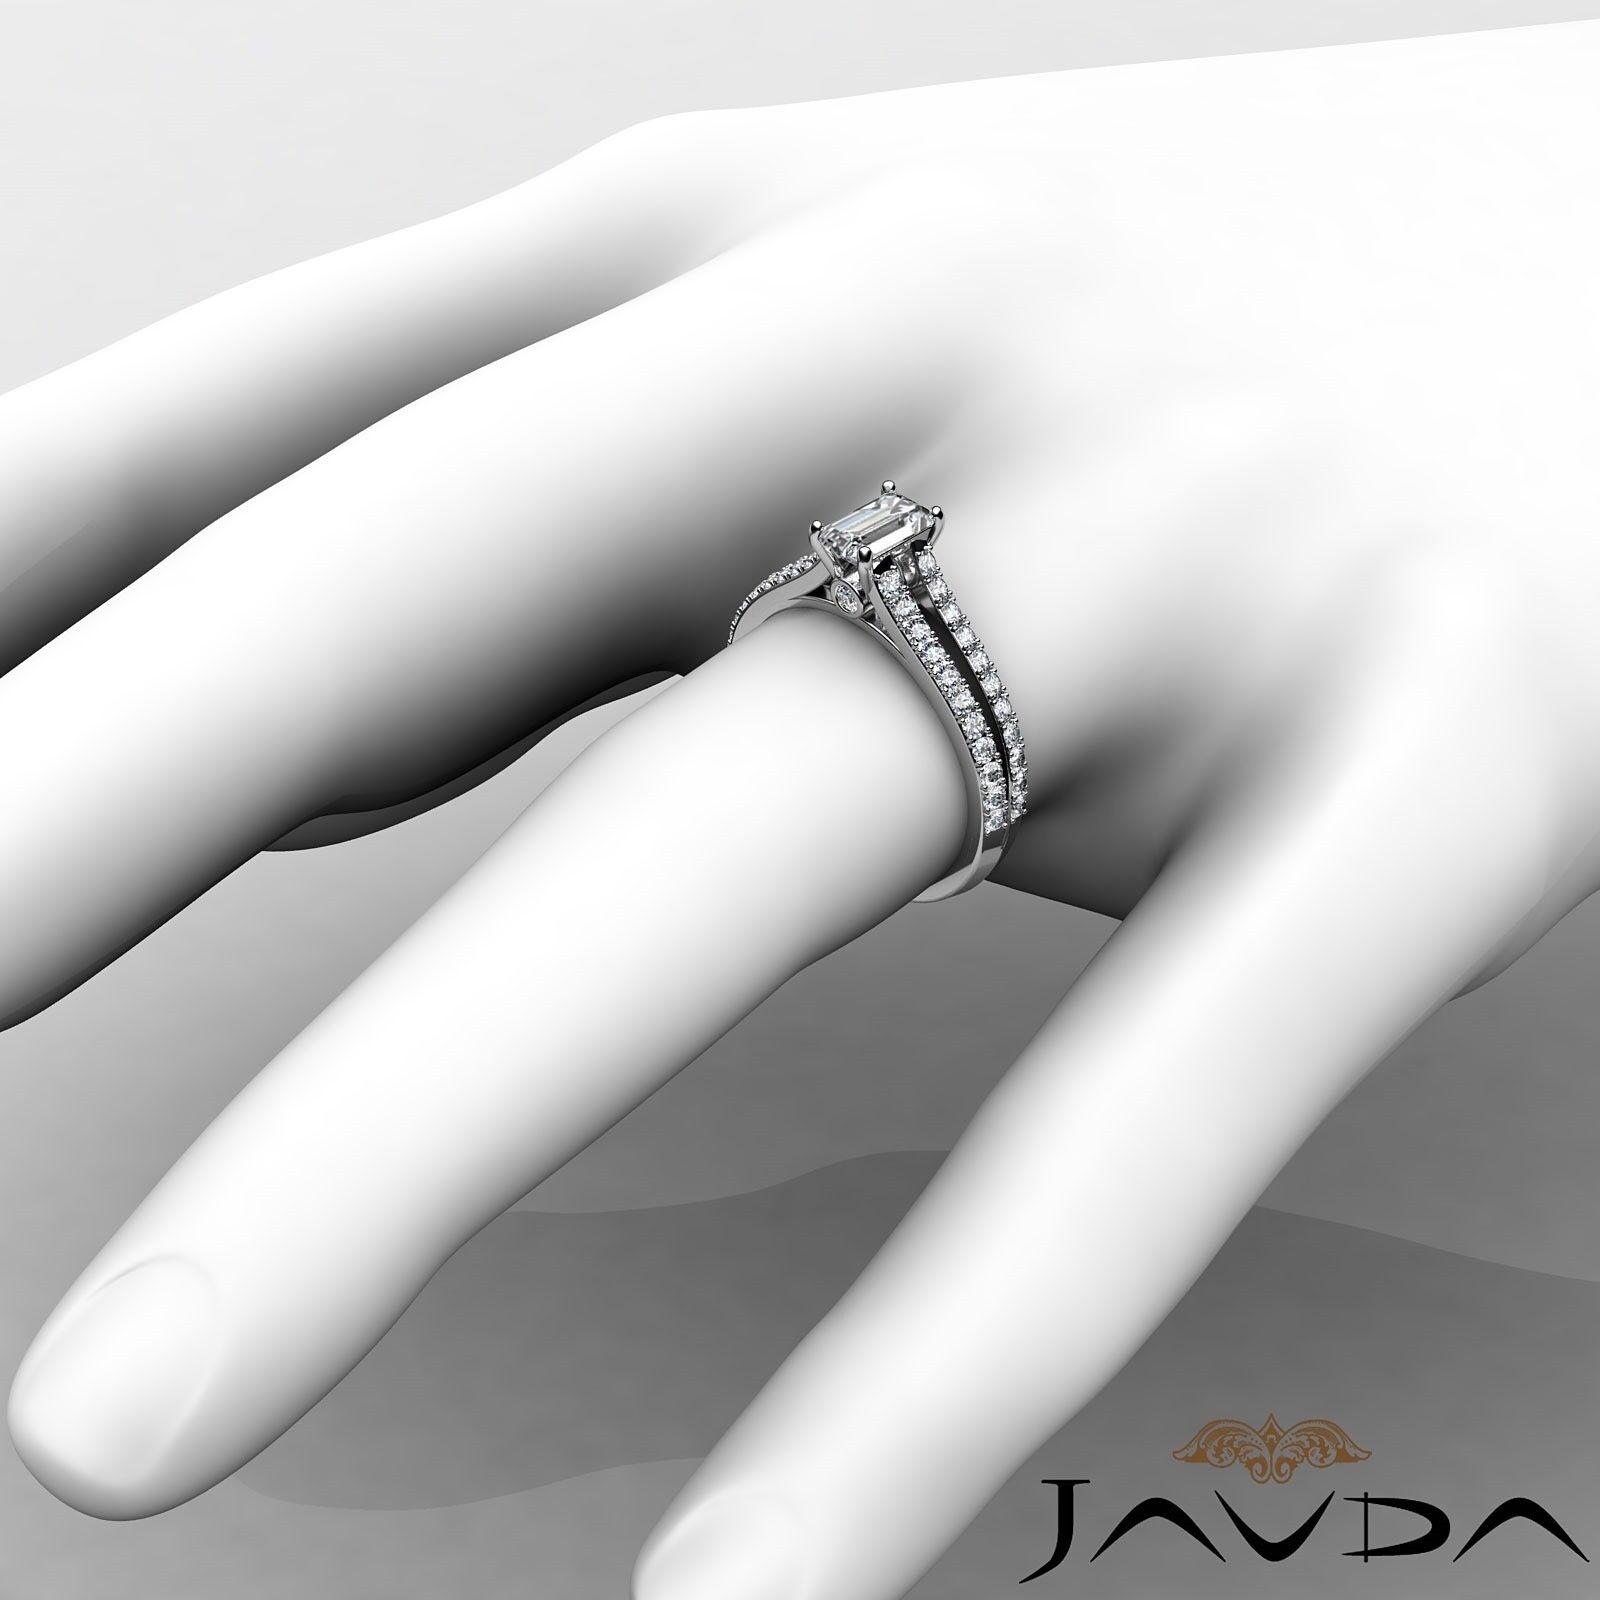 1.45ctw Prong Split Emerald Diamond Engagement Ring Band GIA E-VVS2 White Gold 2